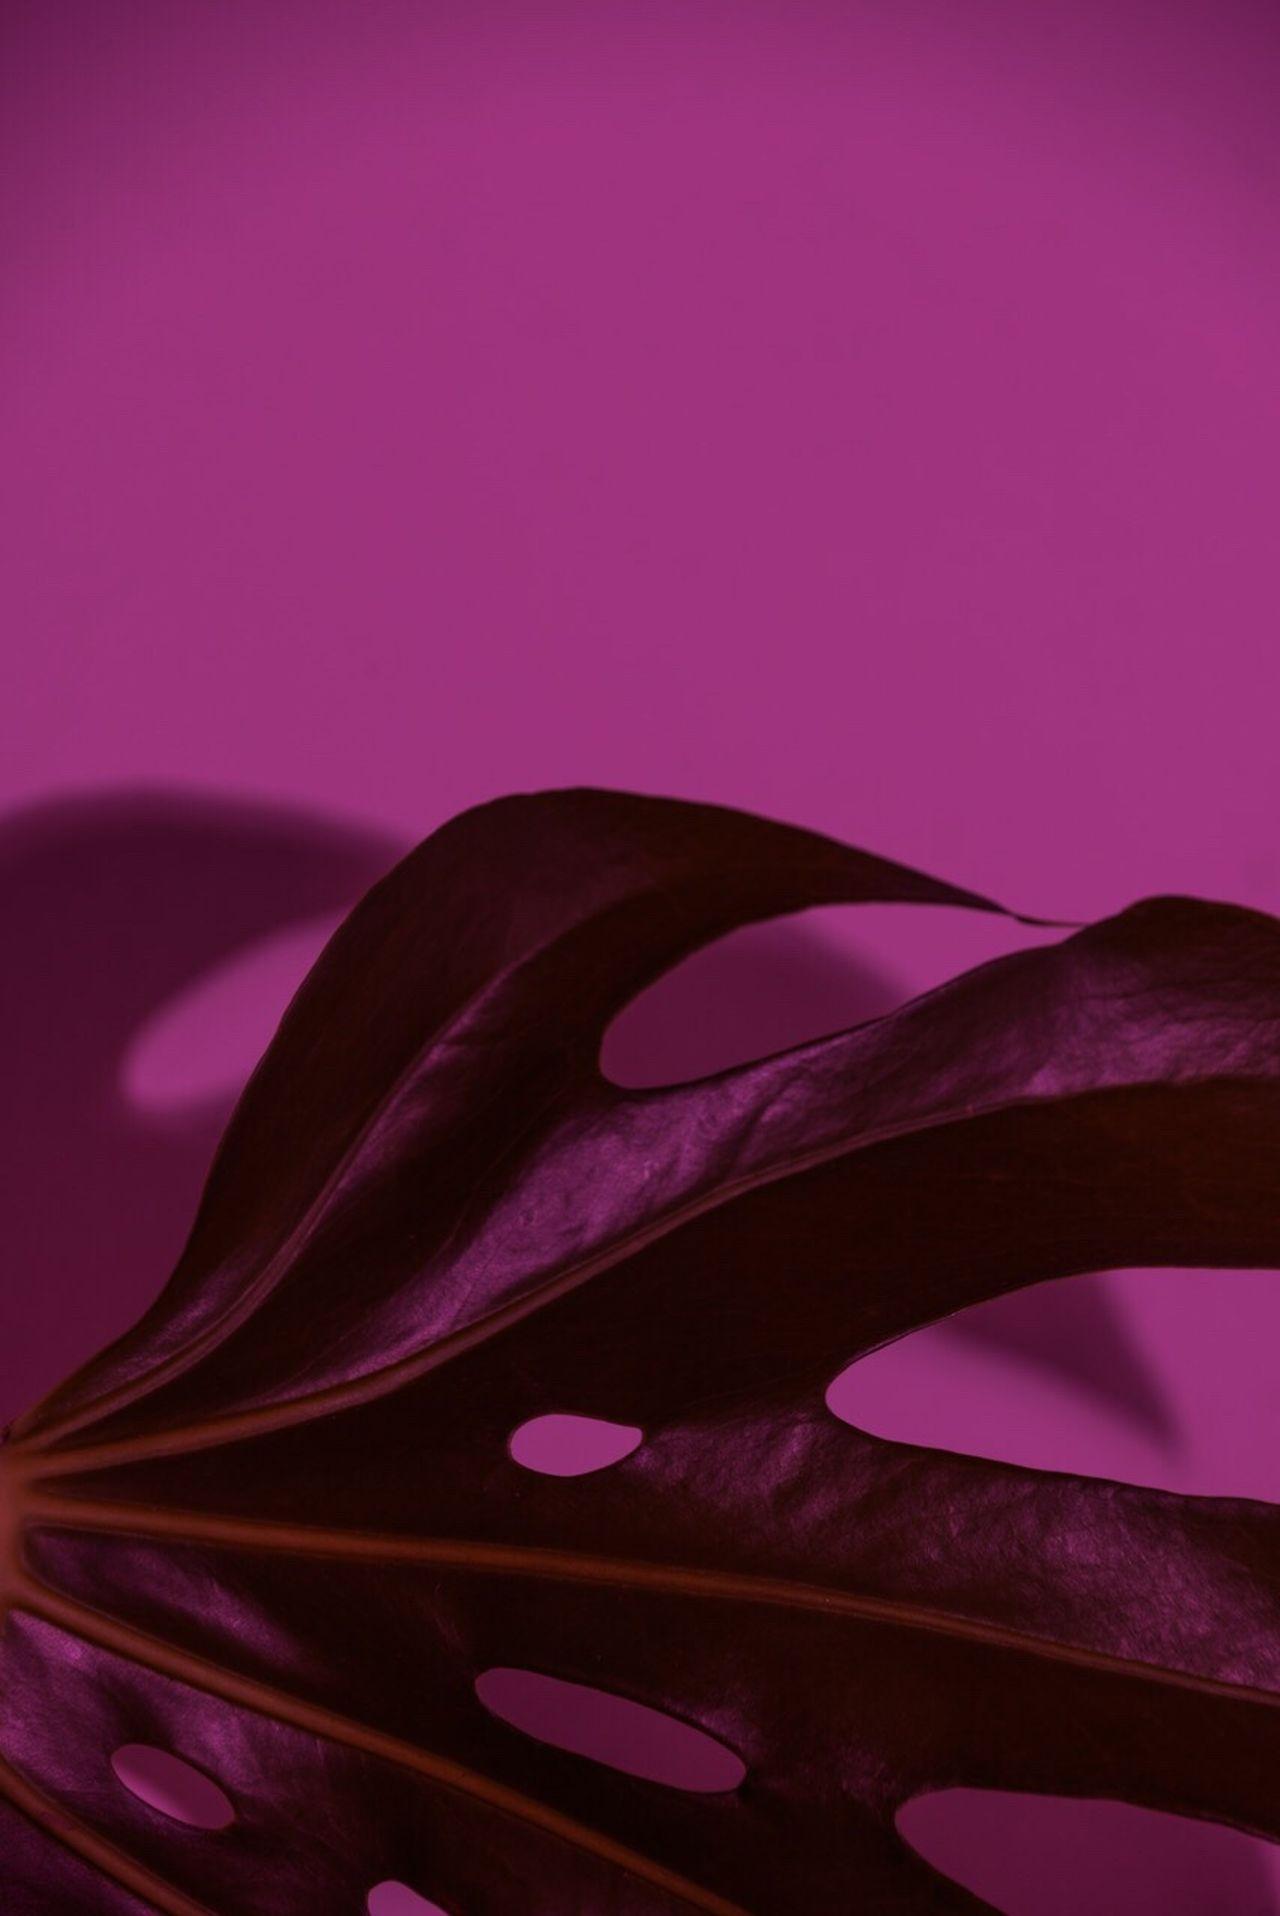 Deliciousmonster Plant Neon Lifestyle Pink